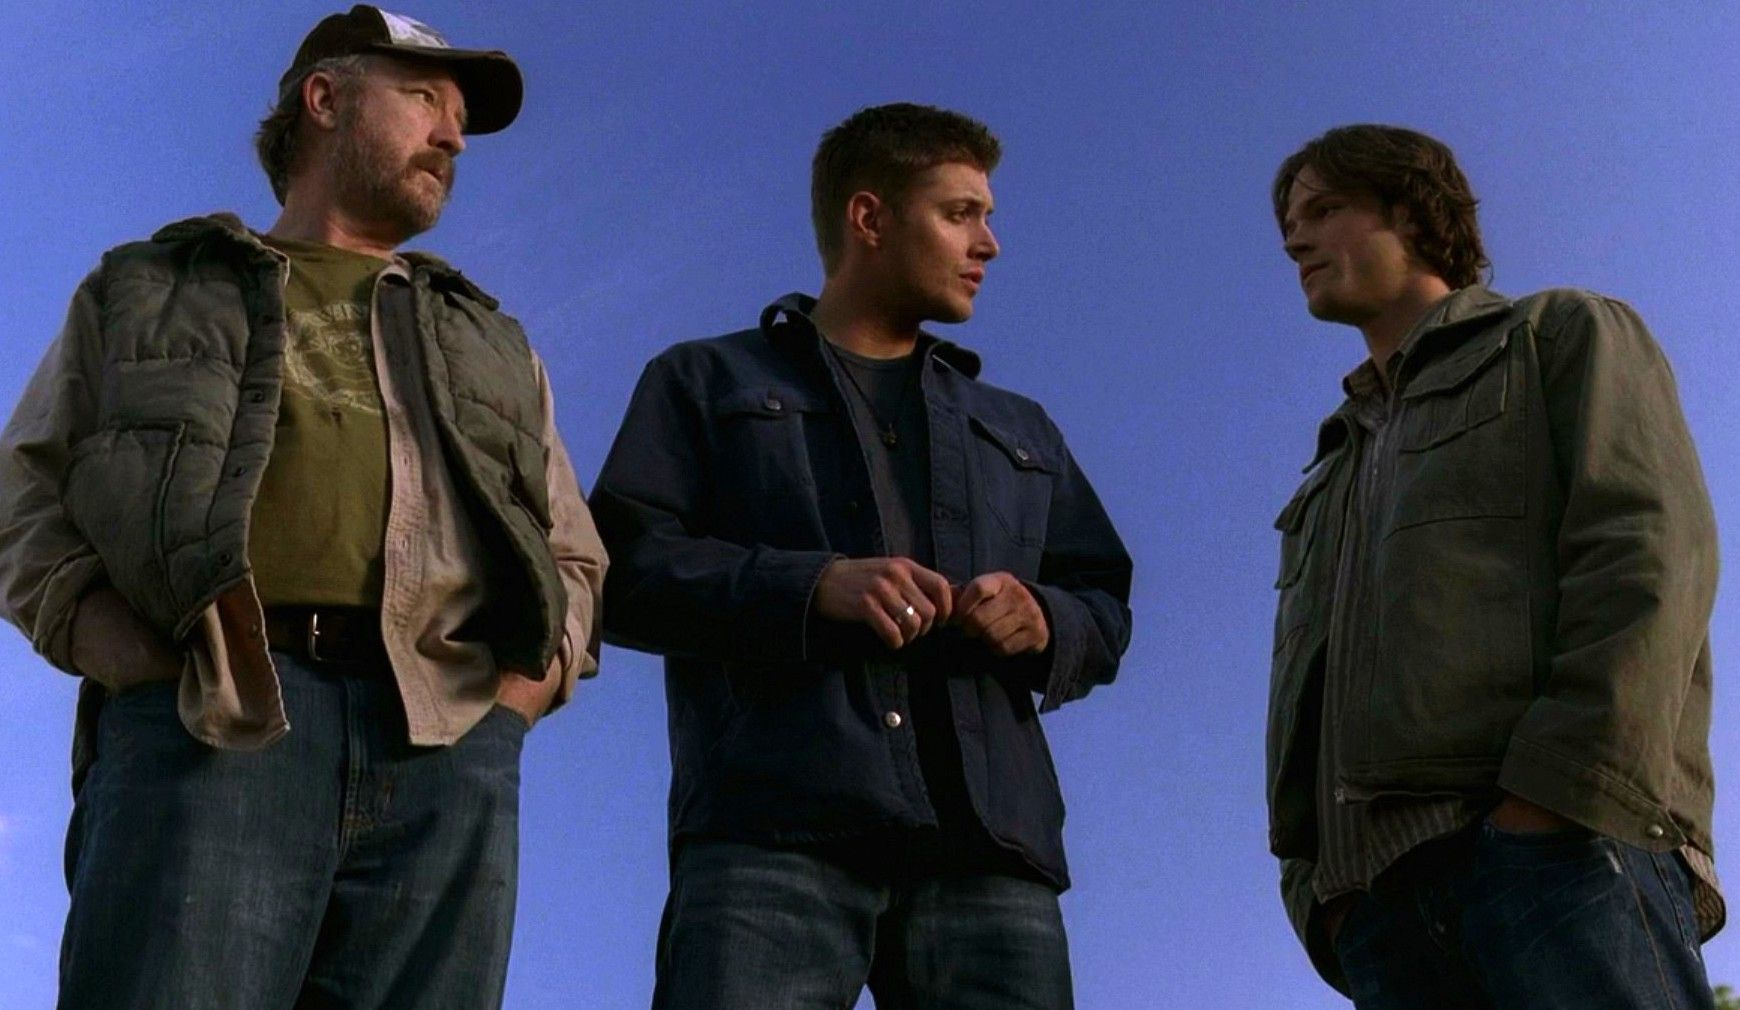 Bobby, Dean and Sam - 3x01 The Magnificent Seven (click for larger pic) | The  magnificent seven, Supernatural, Supernatural season 3